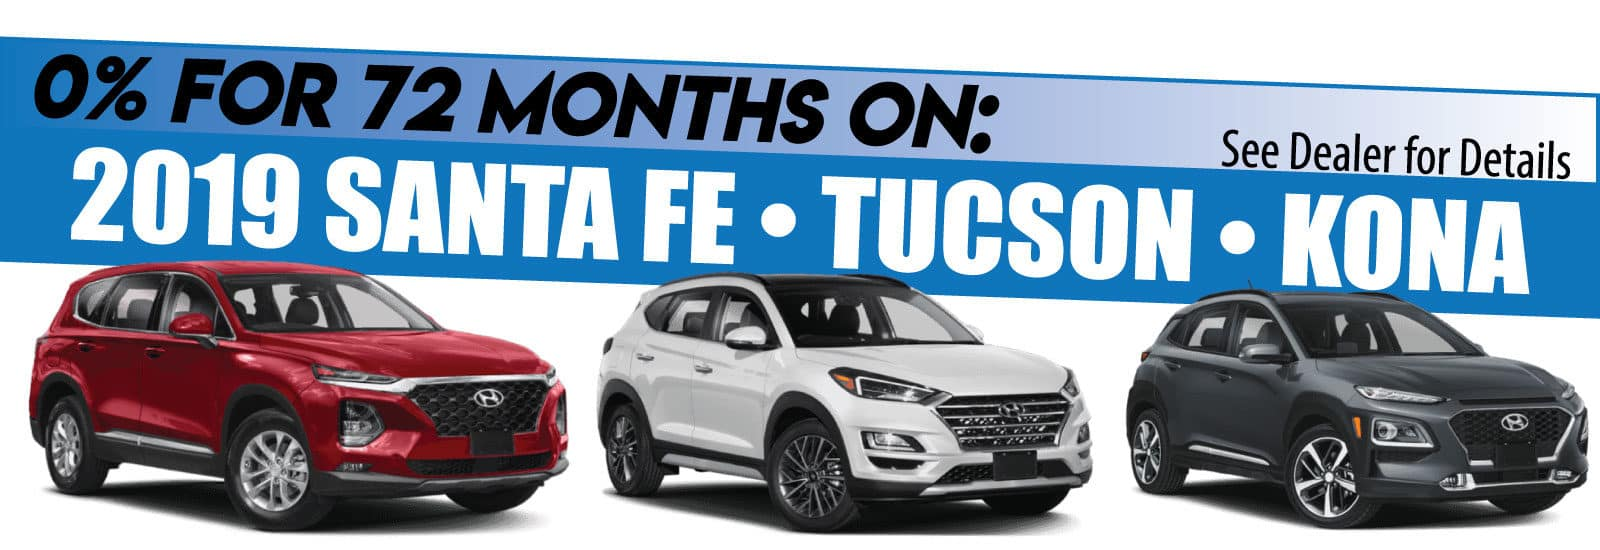 2019-Hyundai-Santa-Fe-Tuscon-Kona-Slider-May-2019